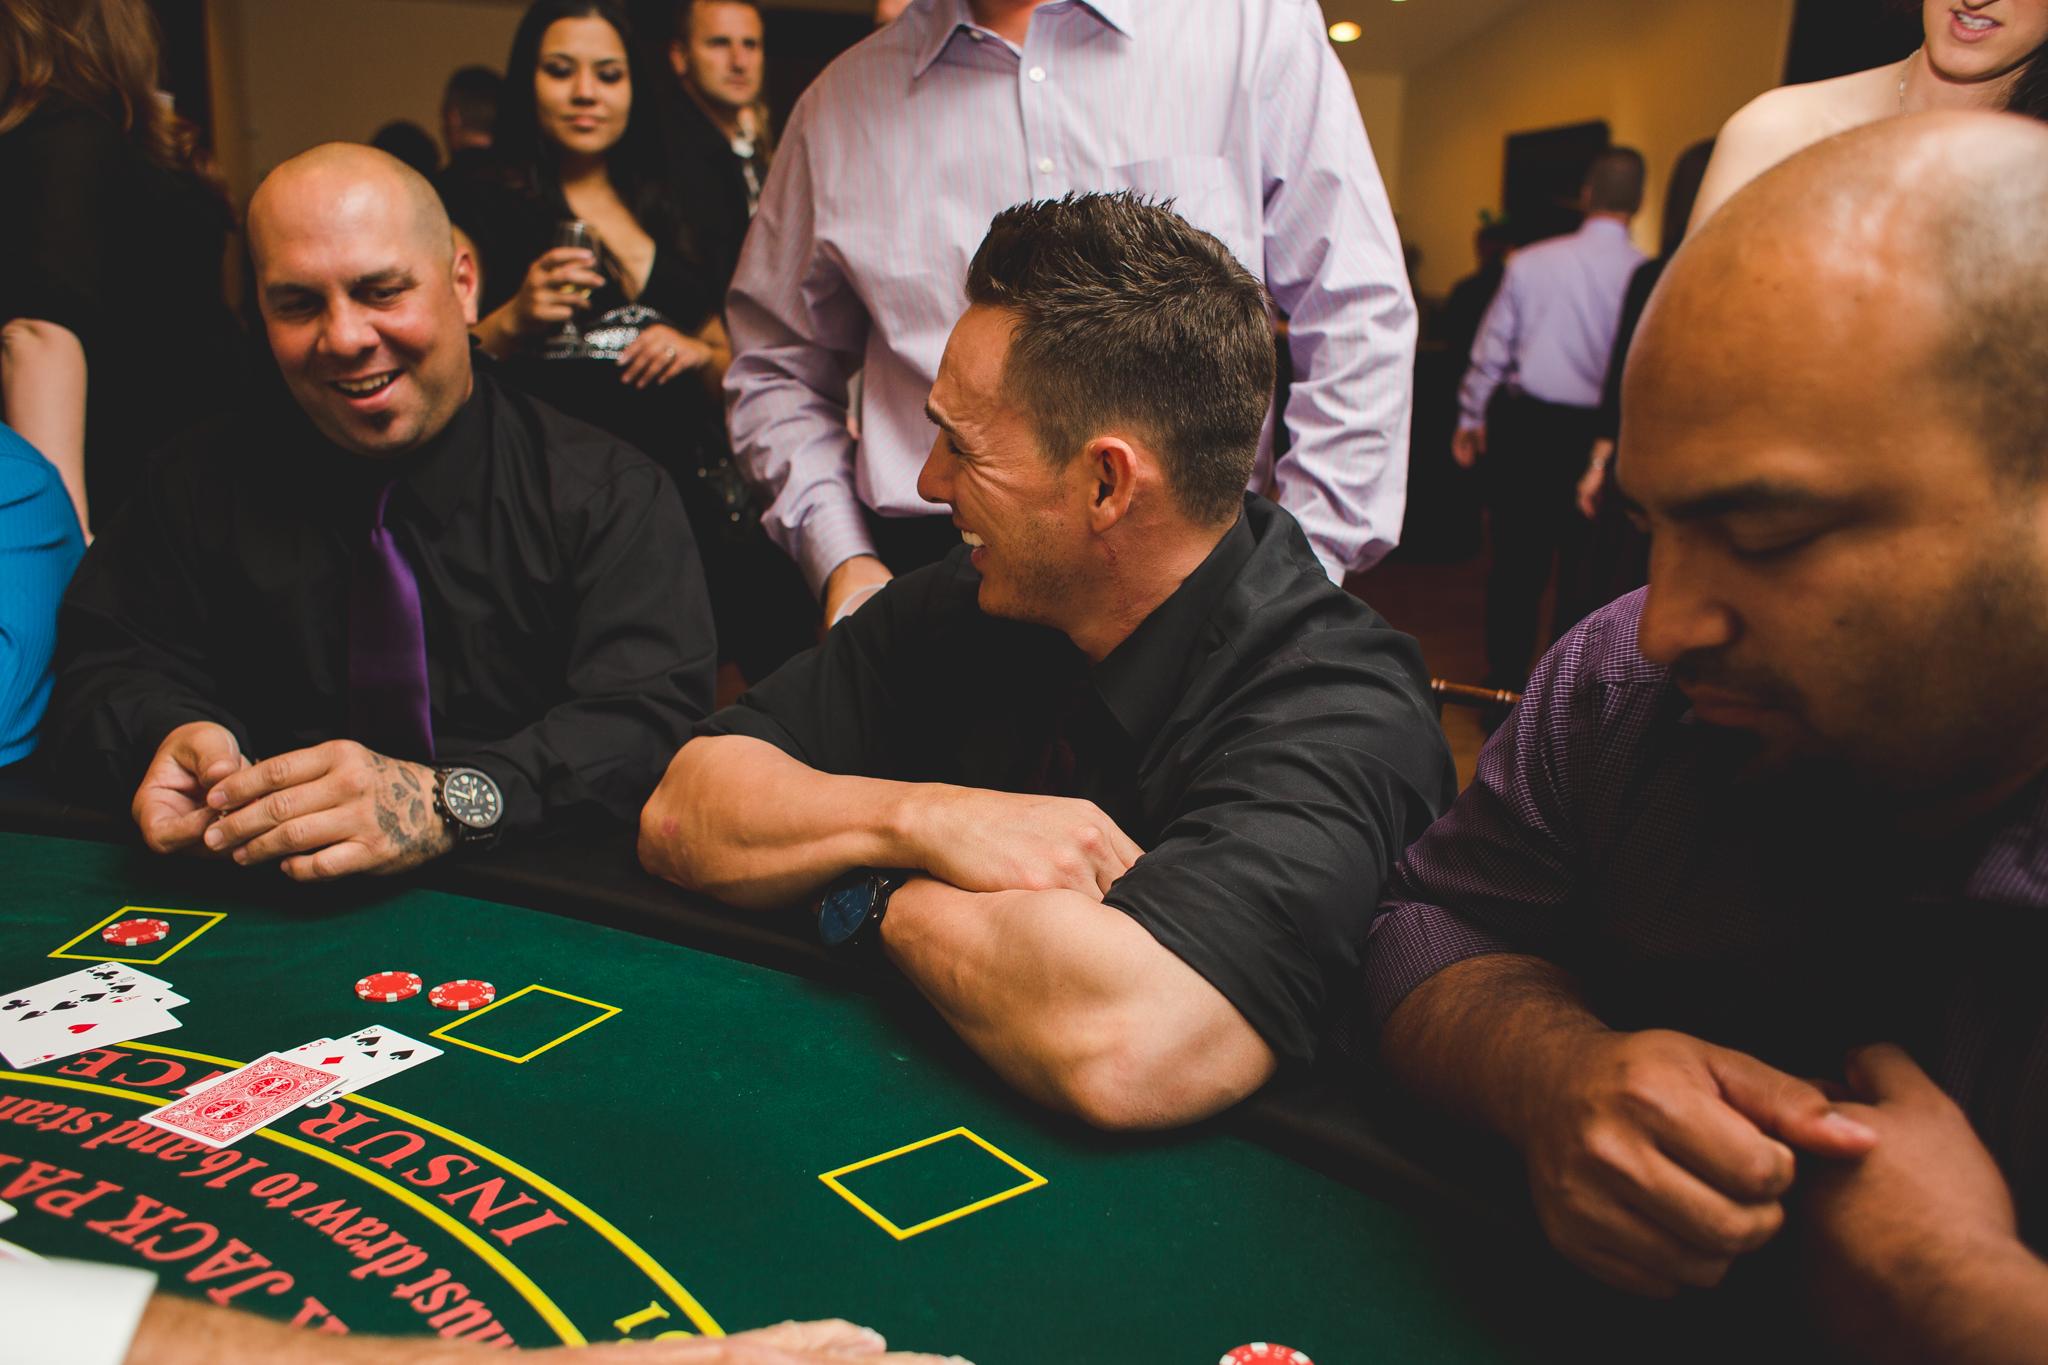 wedding reception blackjack player laughs mj